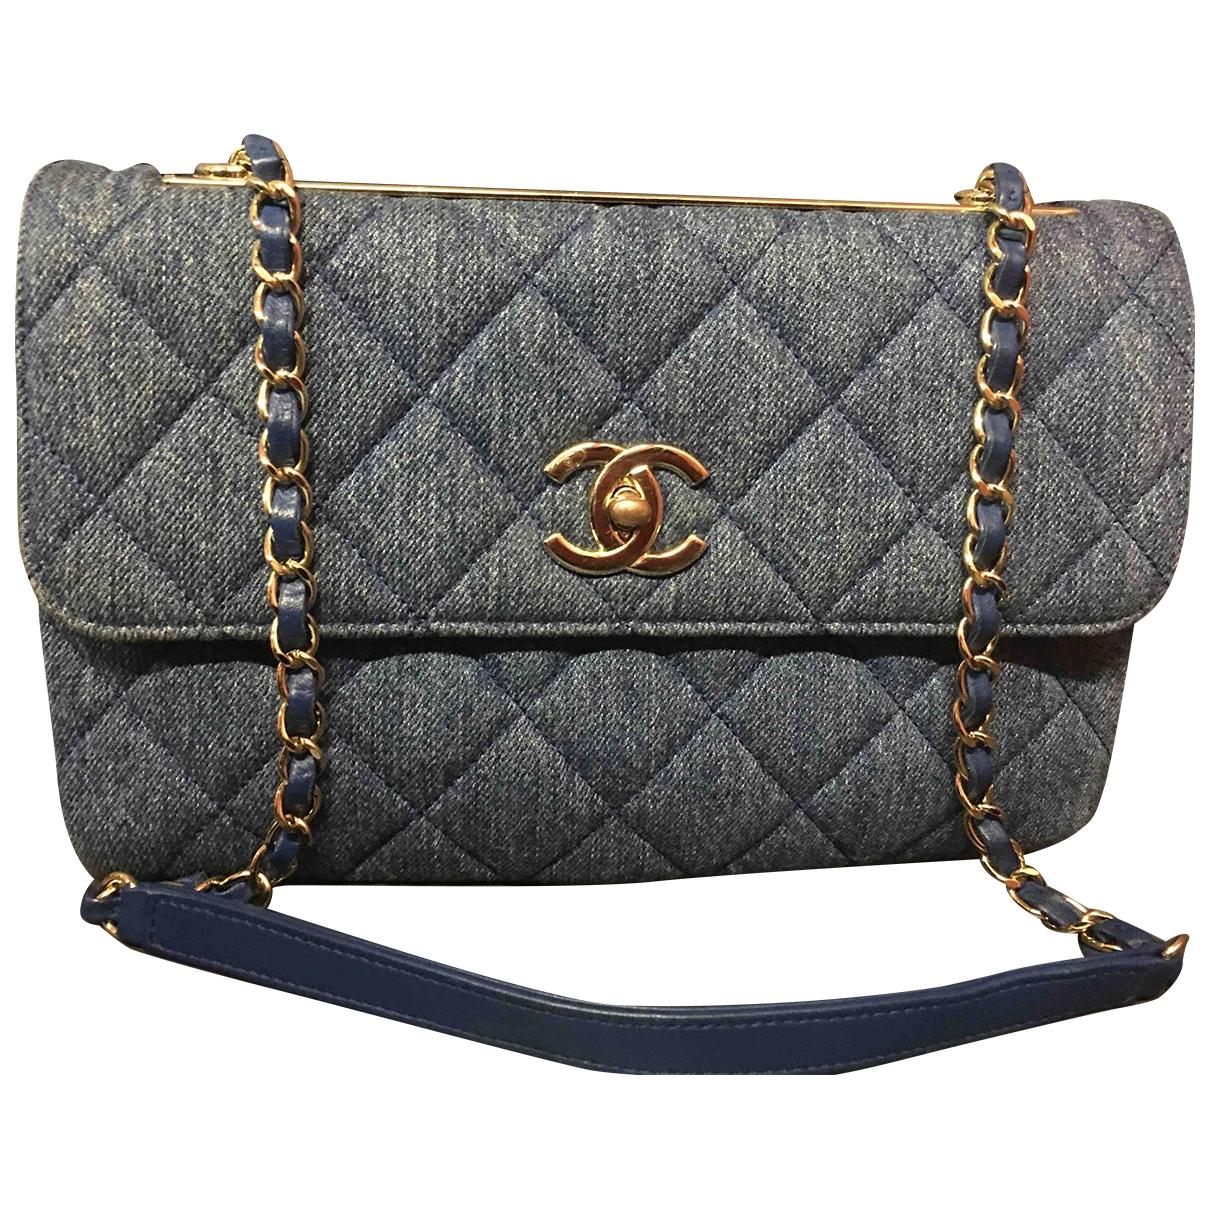 Chanel - Sac a main Trendy CC pour femme en denim - bleu